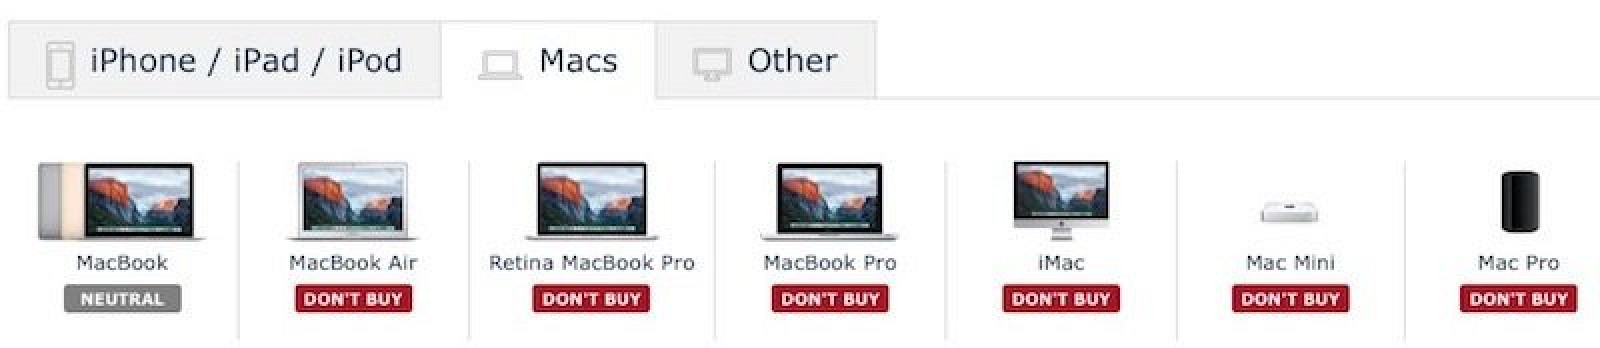 macrumors buyers guide user guide manual that easy to read u2022 rh sibere co used mac mini buying guide mac rumors buying guide mac mini